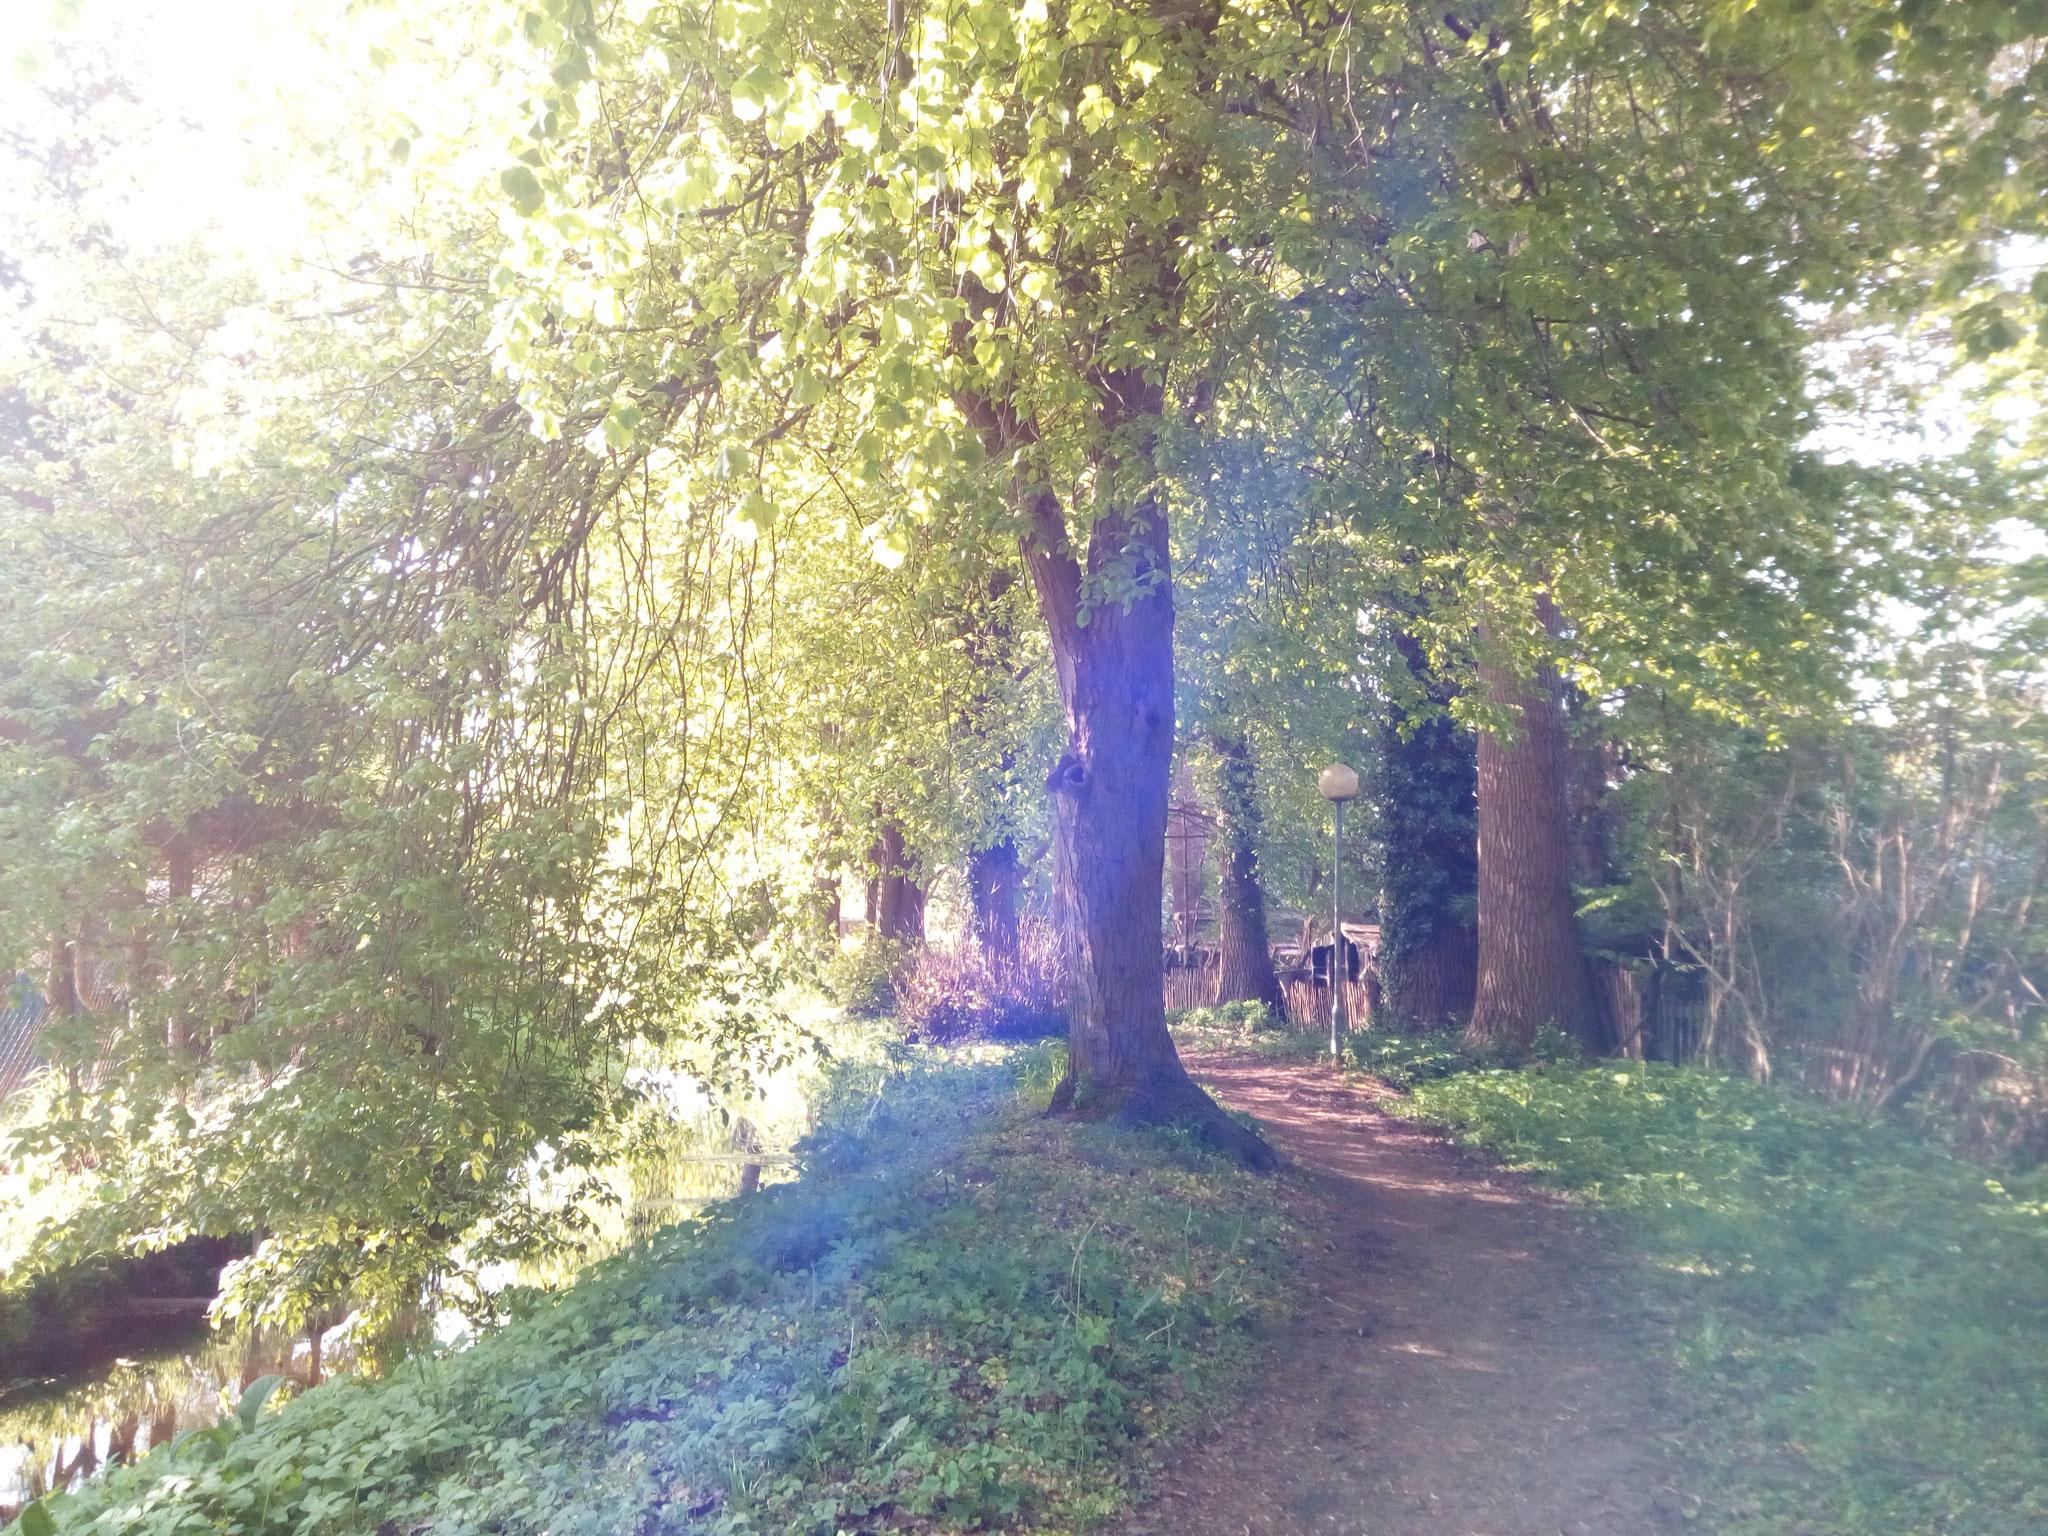 Spaziergang in Loitz